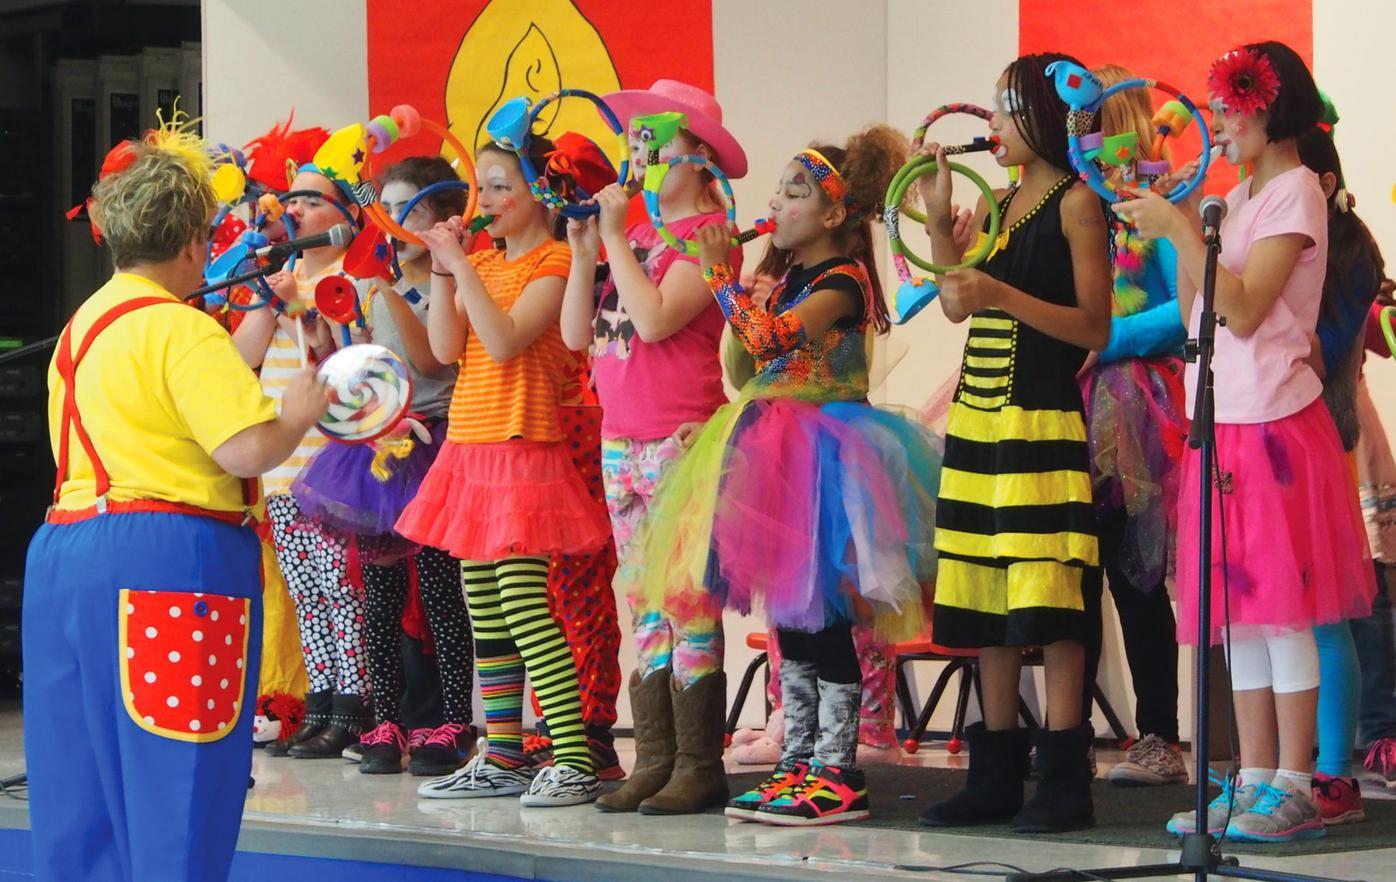 The Silly Nilly Clown Club